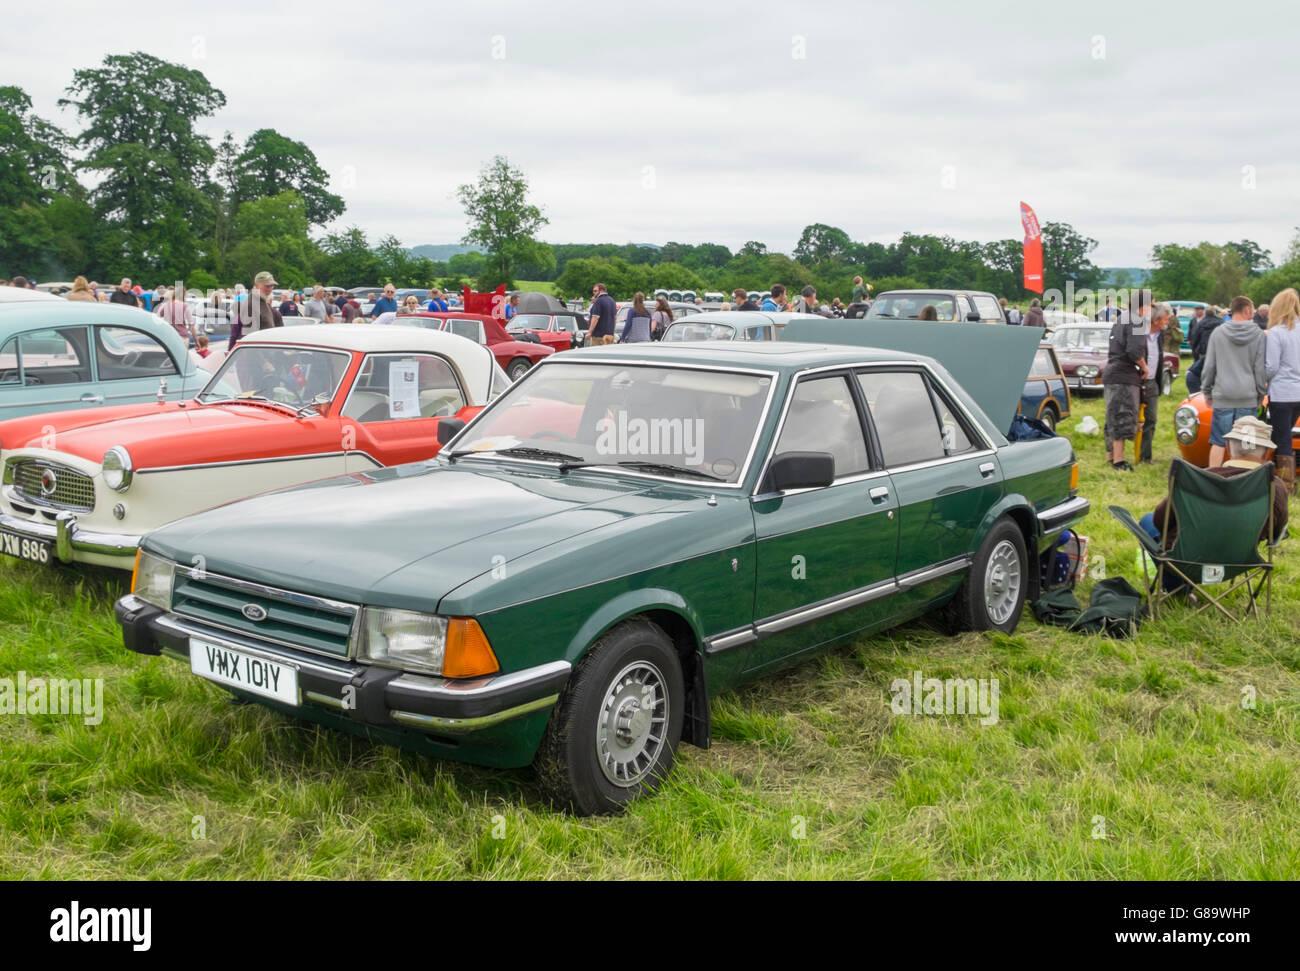 Berkeley castle classic car show 2016 ford granada stock image